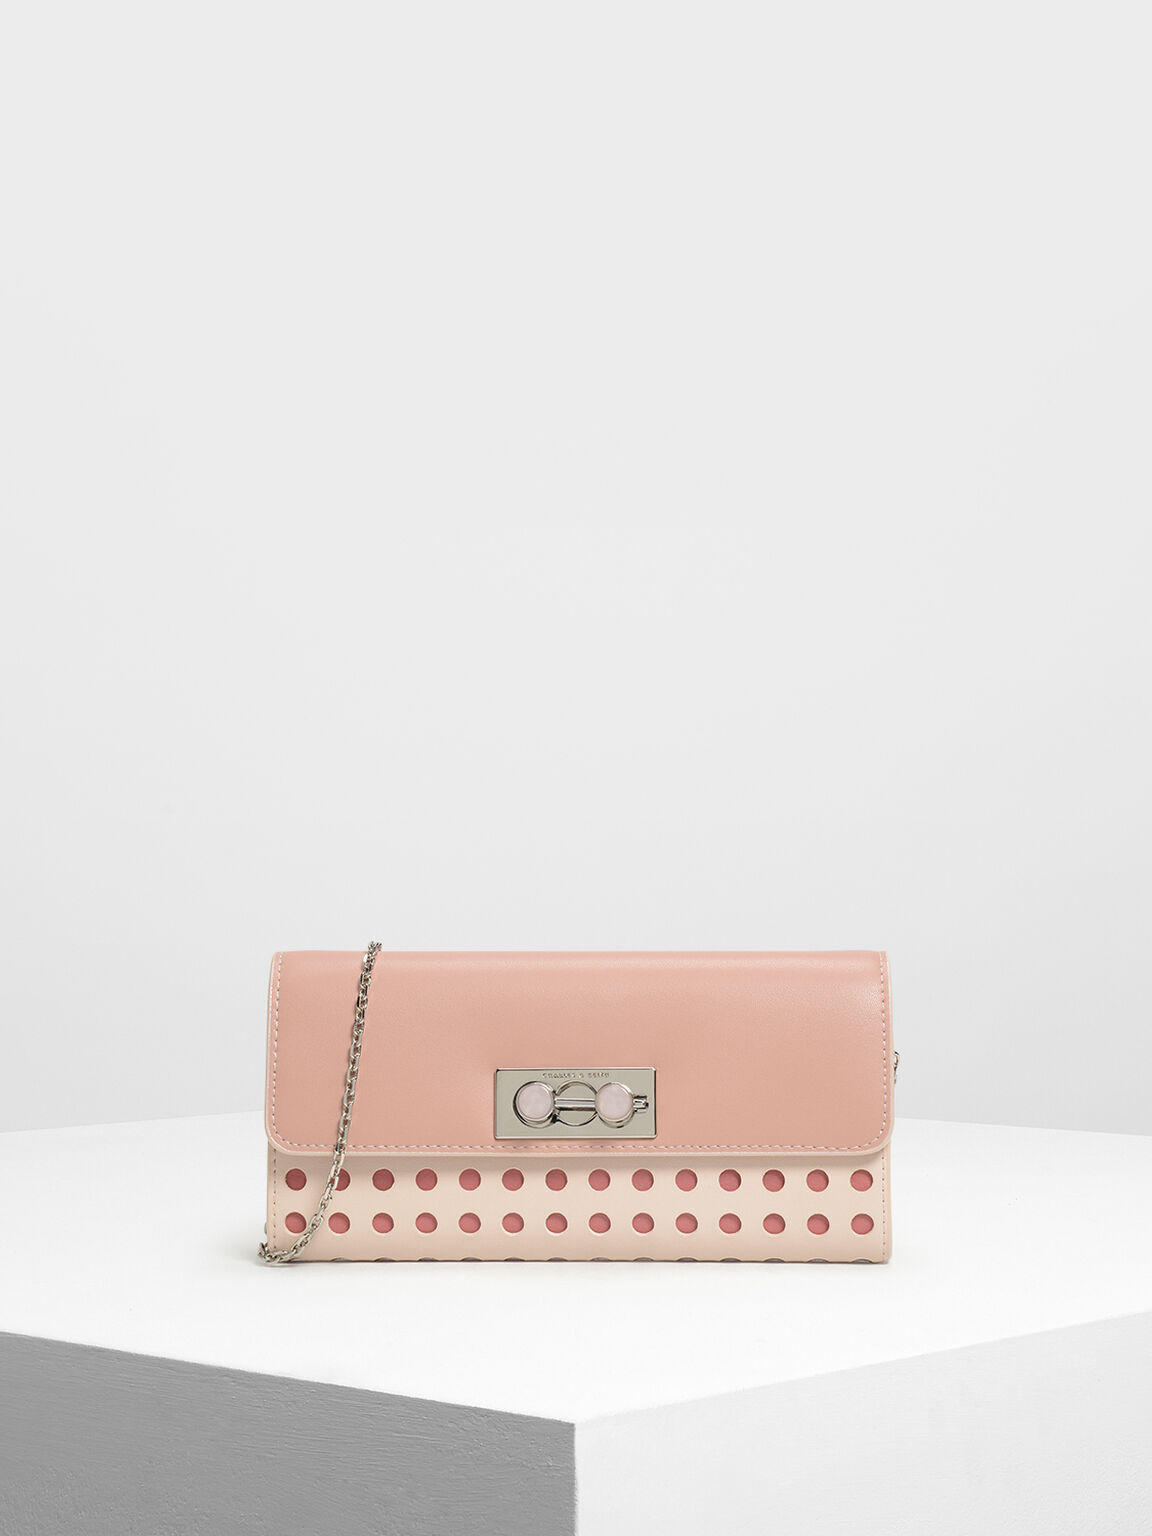 寶石壓扣長夾, 淺粉色, hi-res